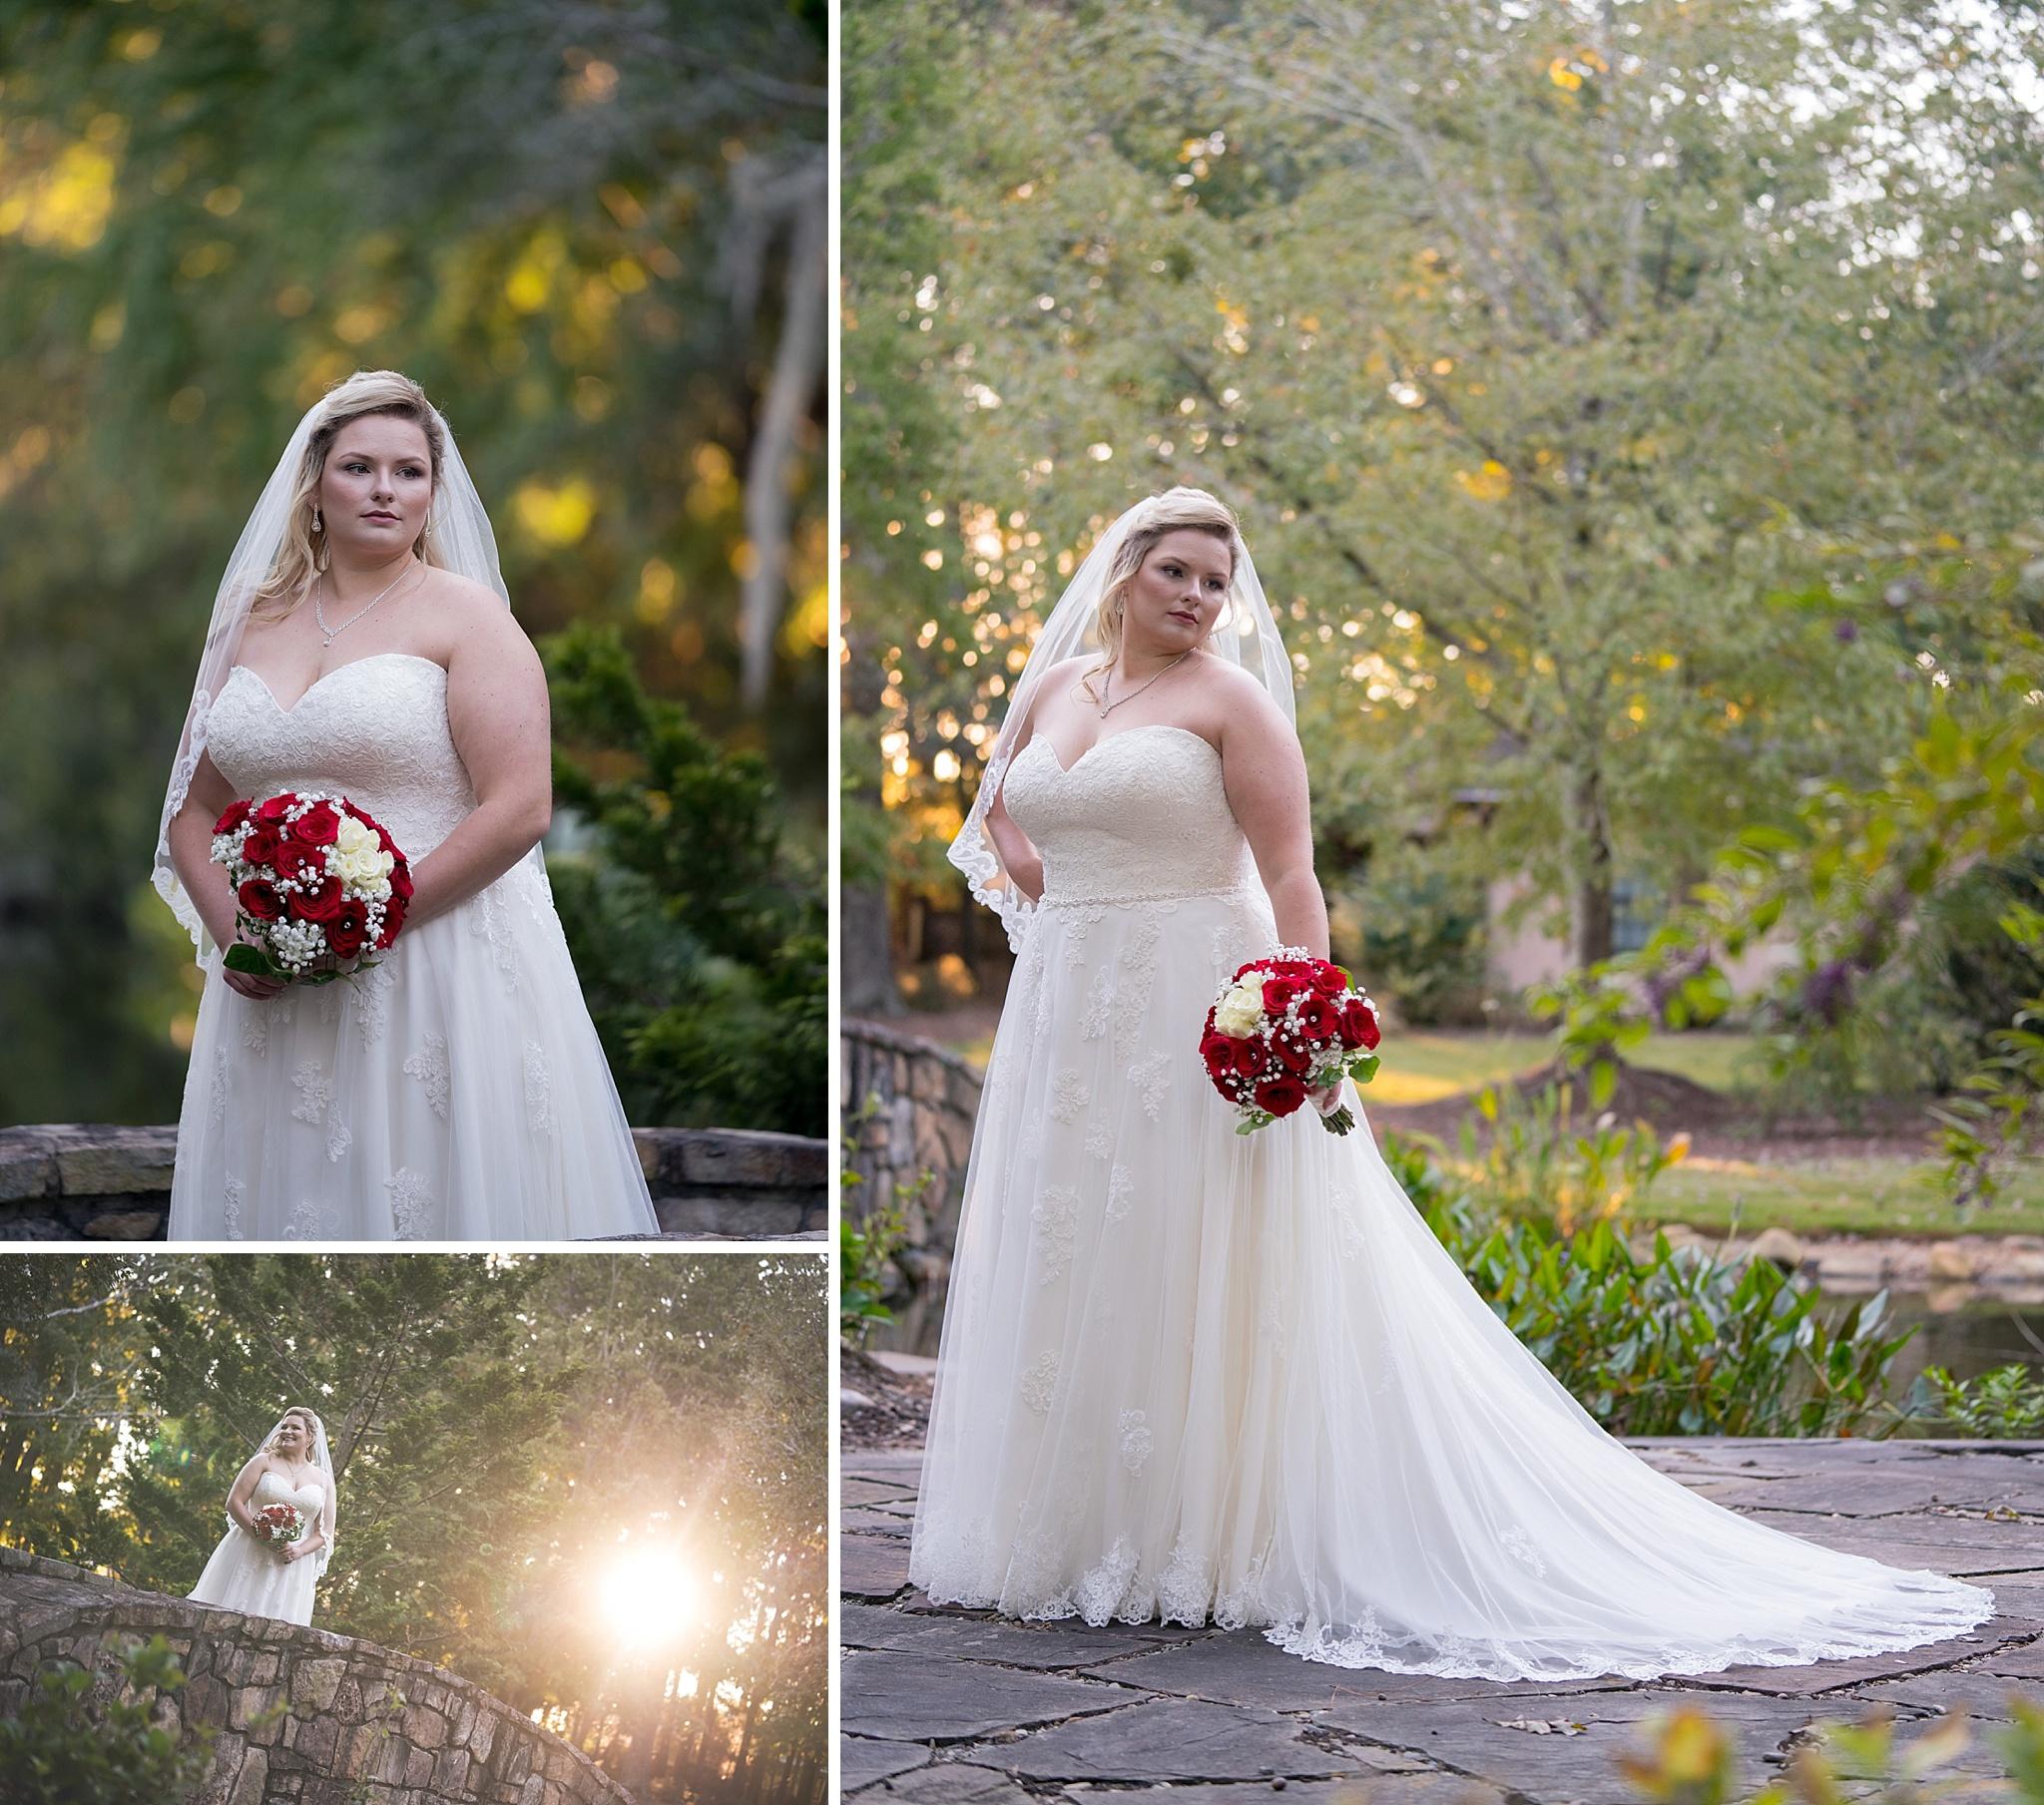 Little-Herb-House-Wedding-Photographer-064.jpg